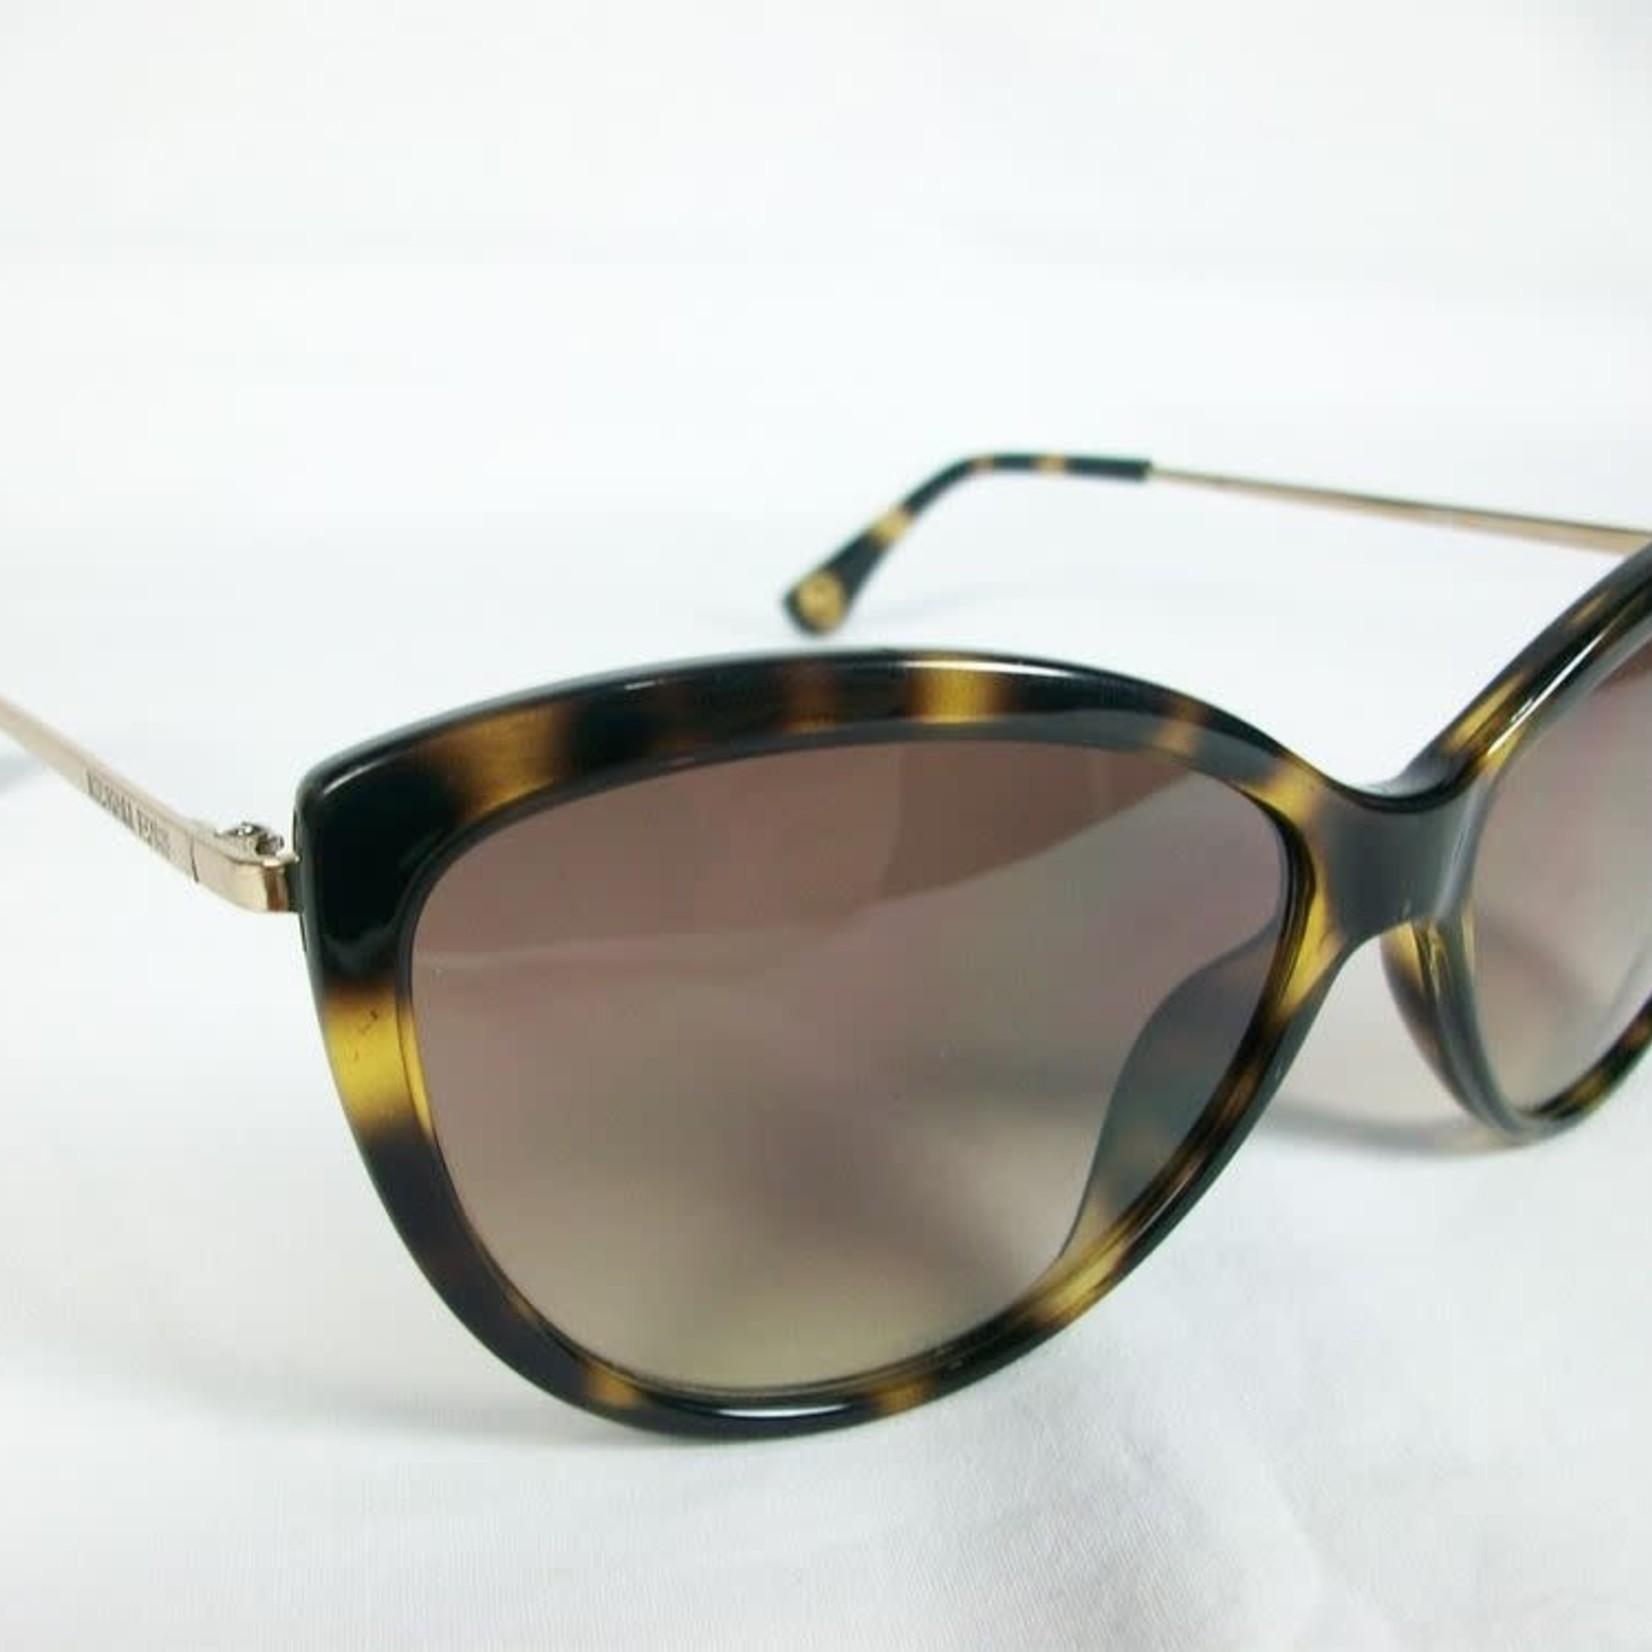 Michael Kors Billy Sunglasses M2491S